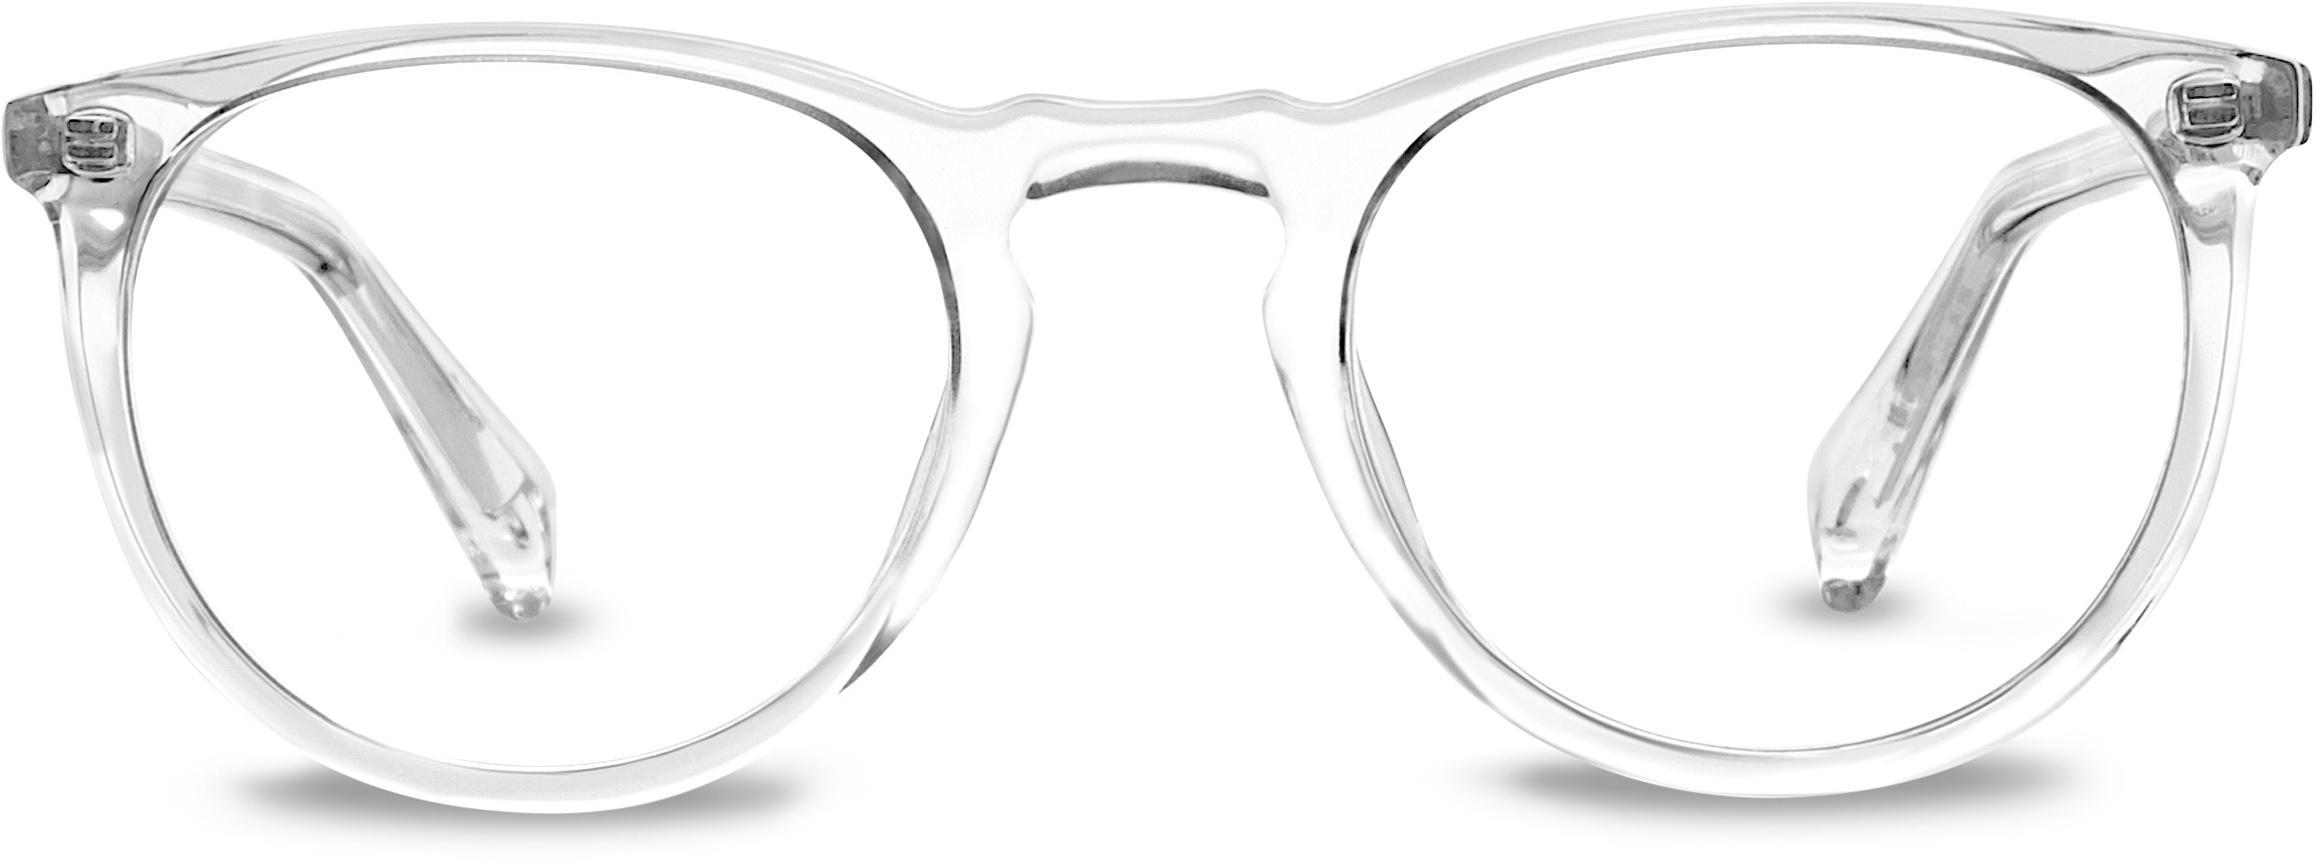 0099bdf2d5d Women s Eyeglasses